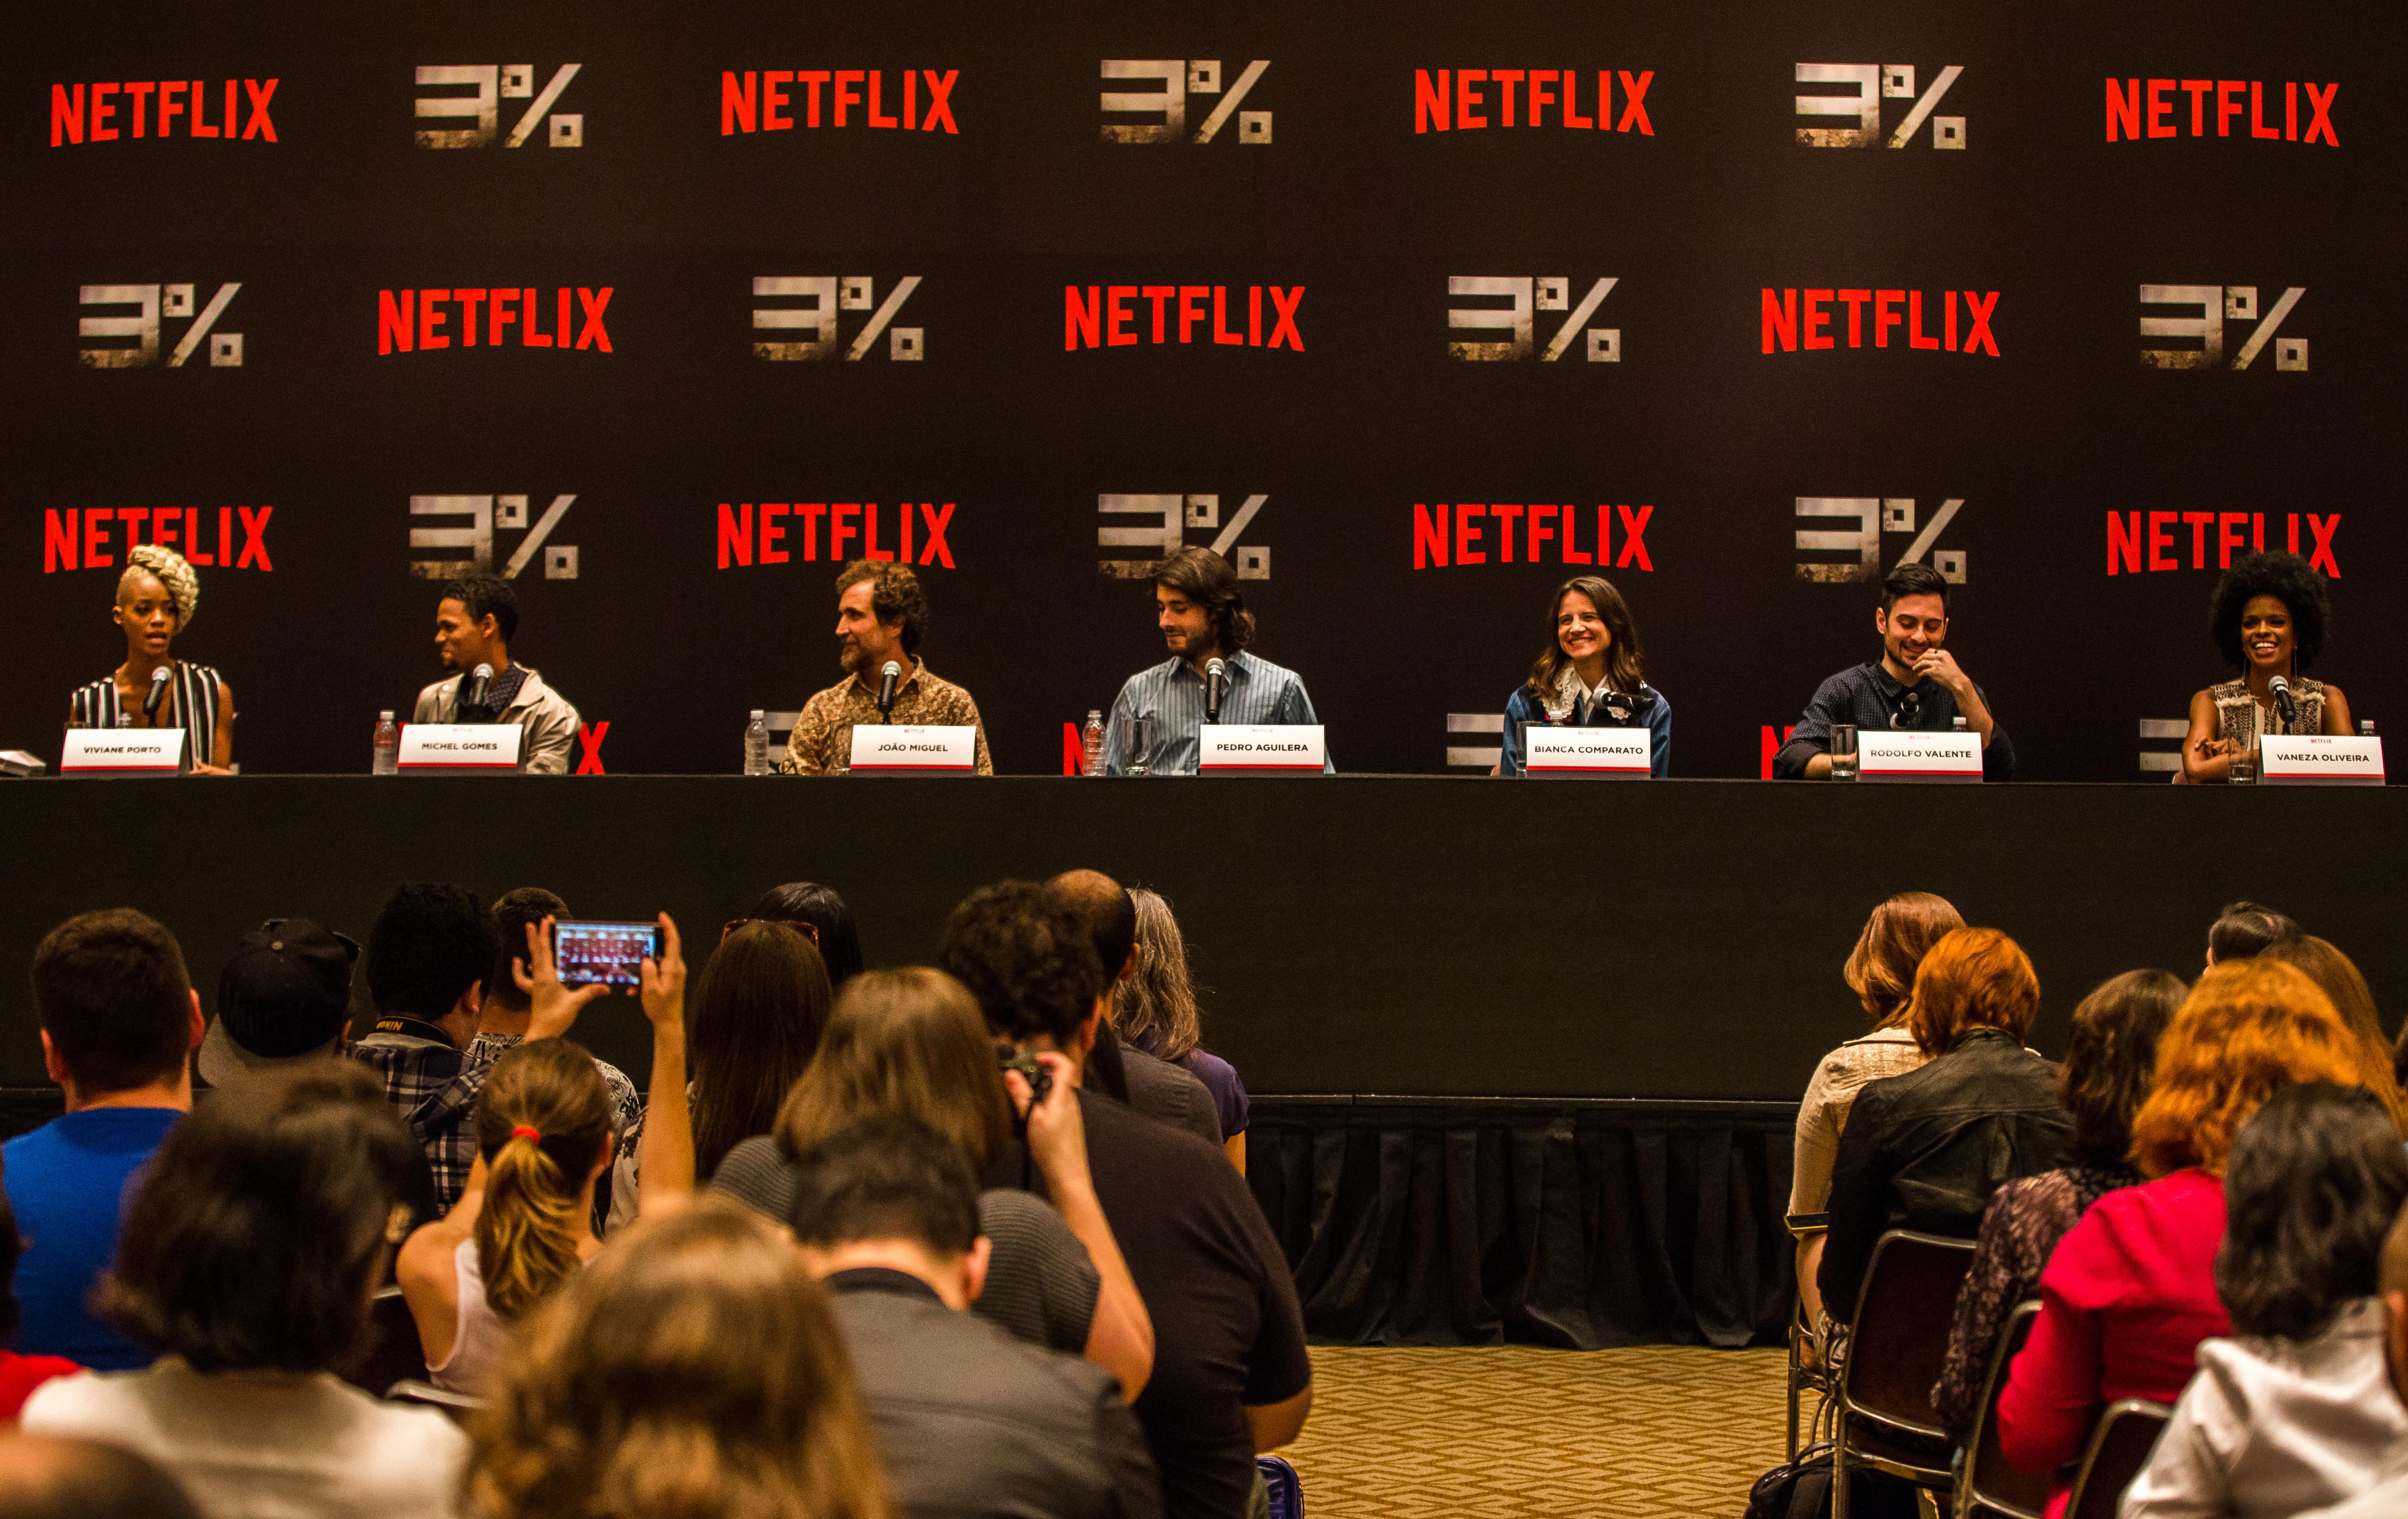 Netflix 3% S1, Press Coference 2016. (Pedro Saad / Netflix) Viviane Porto, Michel Gomes, João Miguel, Pedro Aguilera, Bianca Comparato, Rodolfo Valente, Vaneza Oliveira